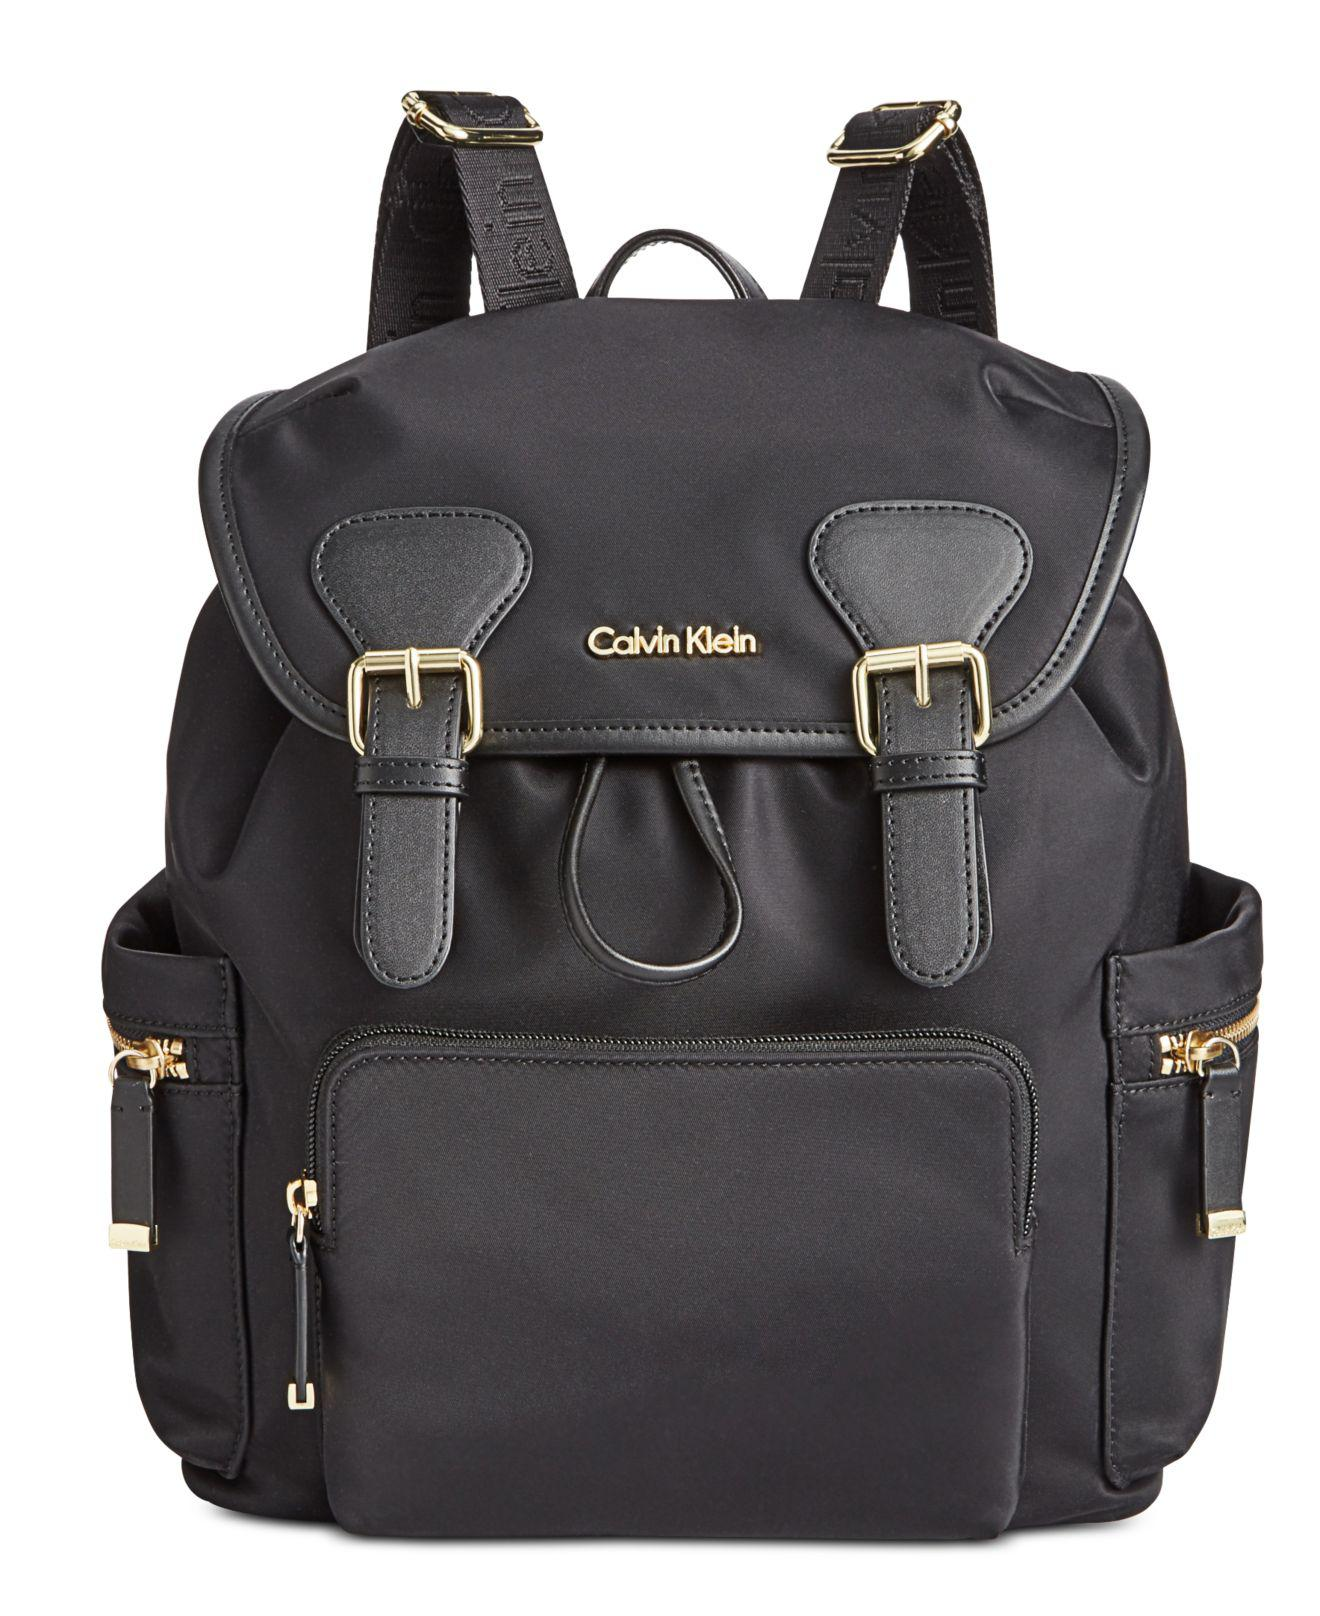 0c8768d063d7 Calvin Klein - Black Double Buckle Backpack - Lyst. View fullscreen